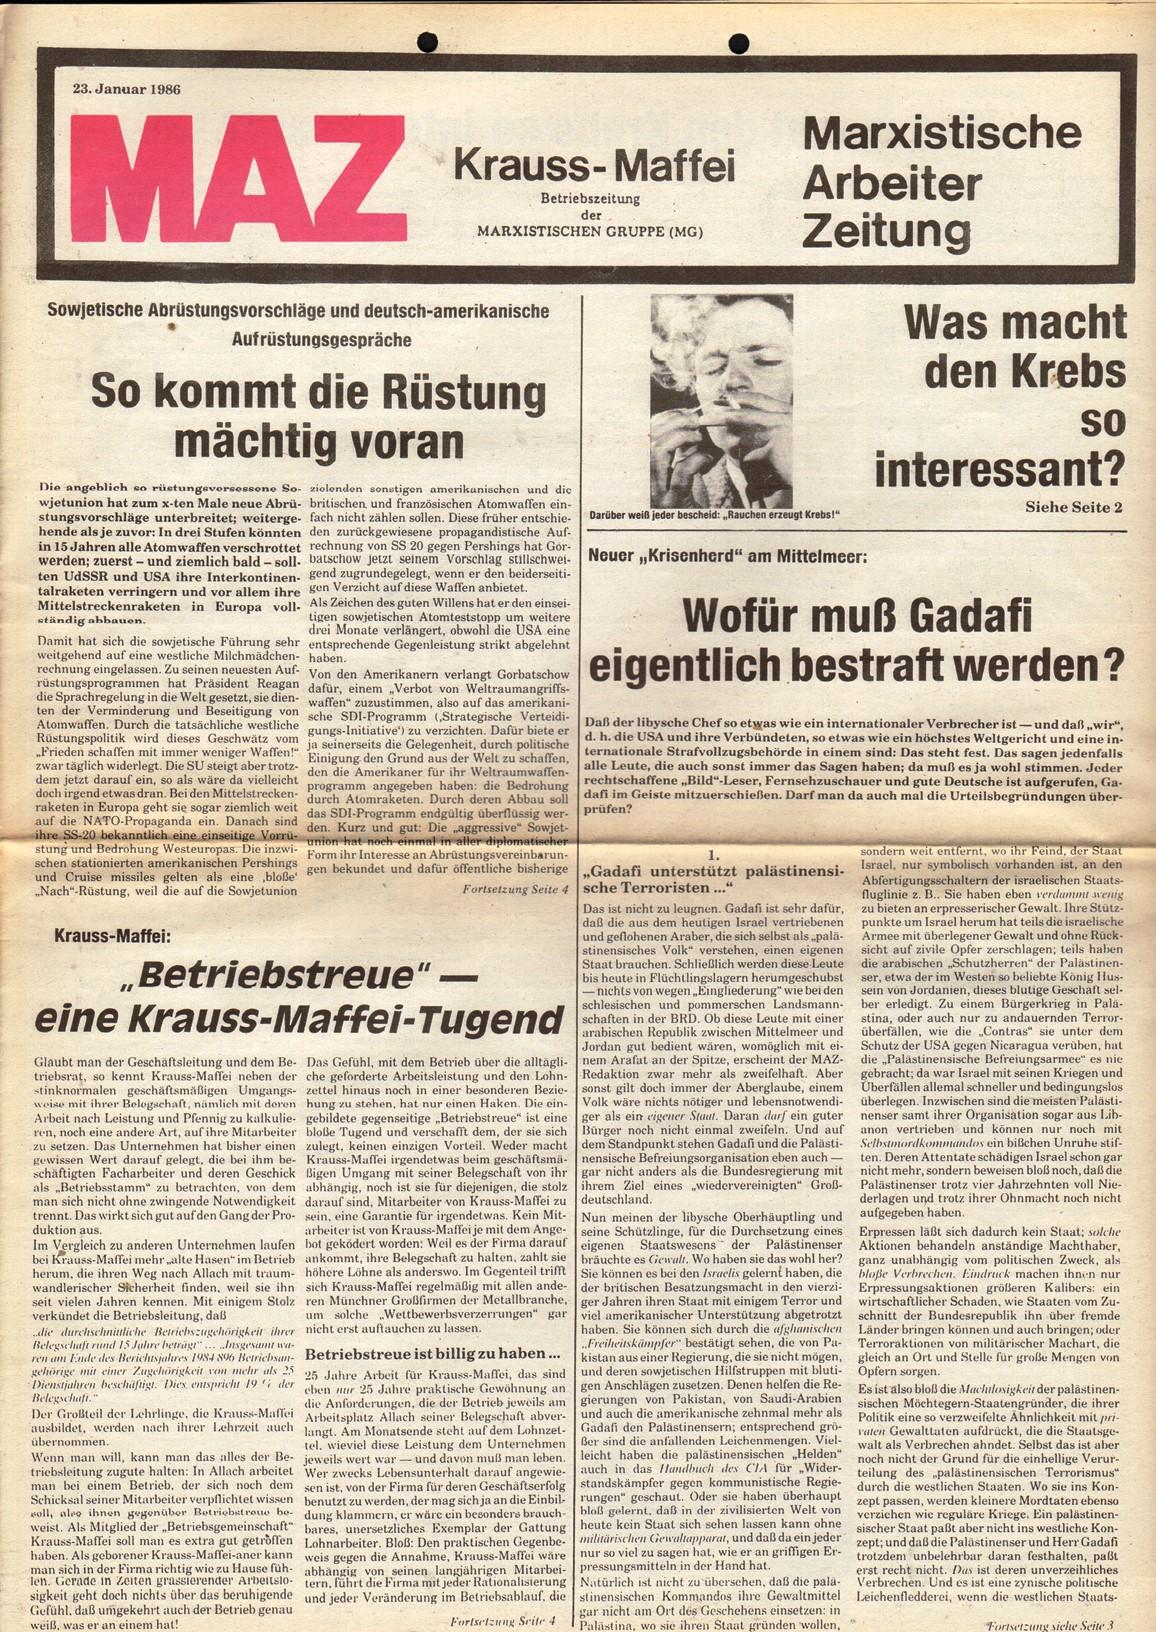 Muenchen_MG_MAZ_Krauss_Maffei_19860123_01